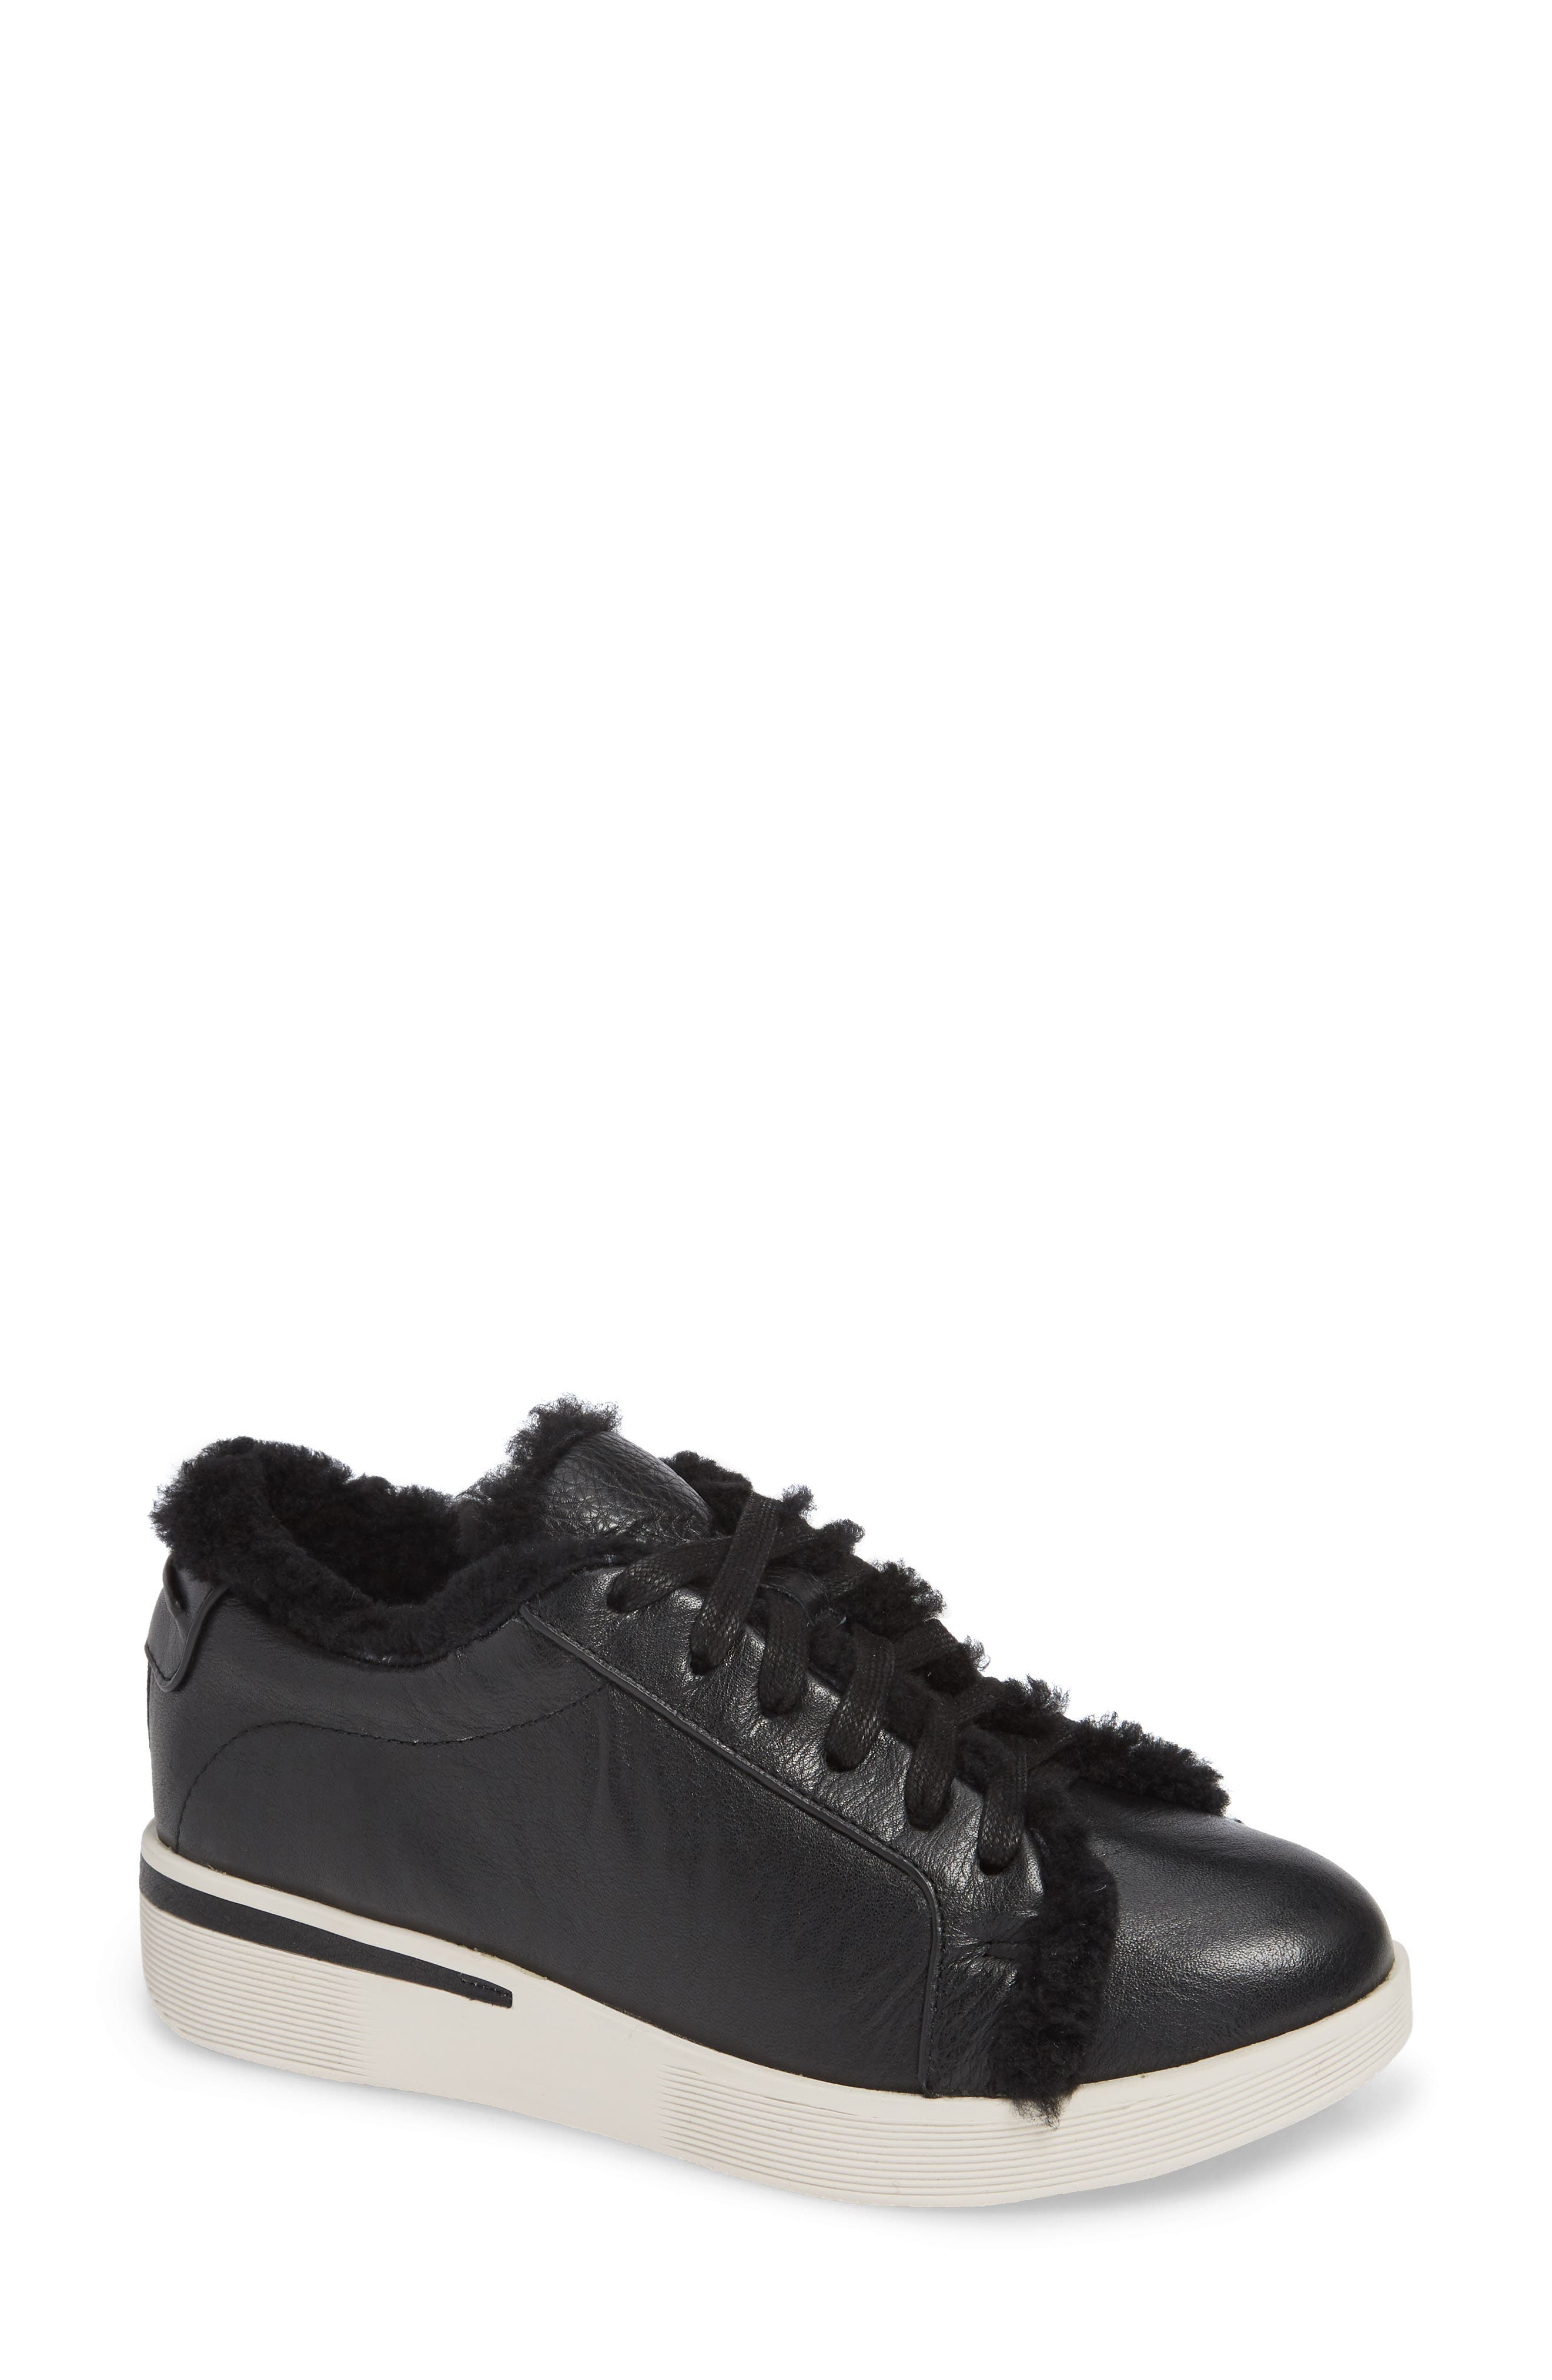 Gentle Souls By Kenneth Cole Haddie Genuine Shearling Lined Sneaker- Black